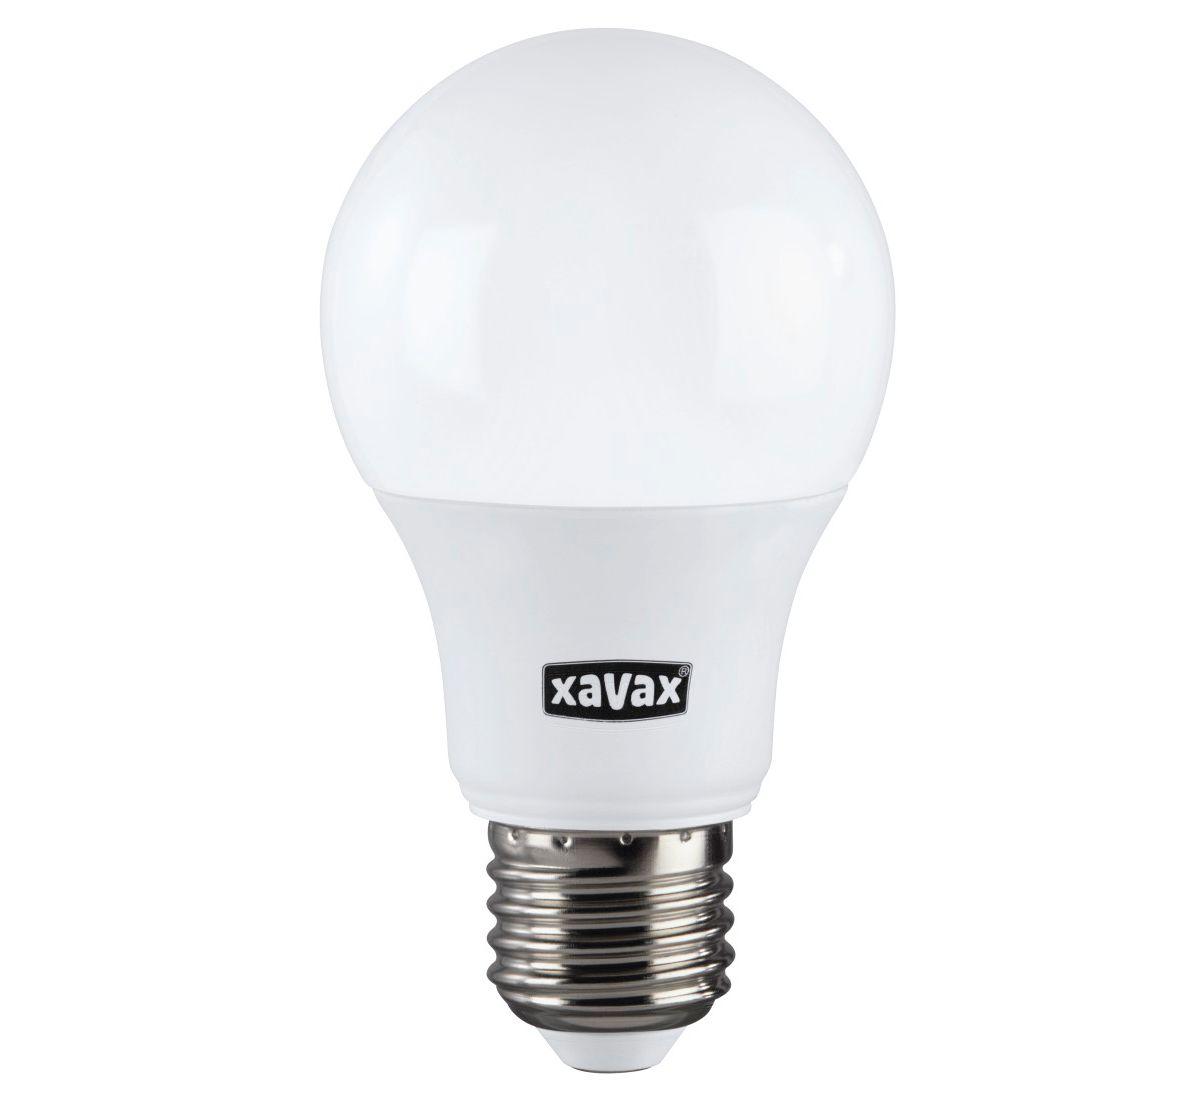 Xavax LED-Lampe, E27, 806lm ersetzt 60W Glühlam...